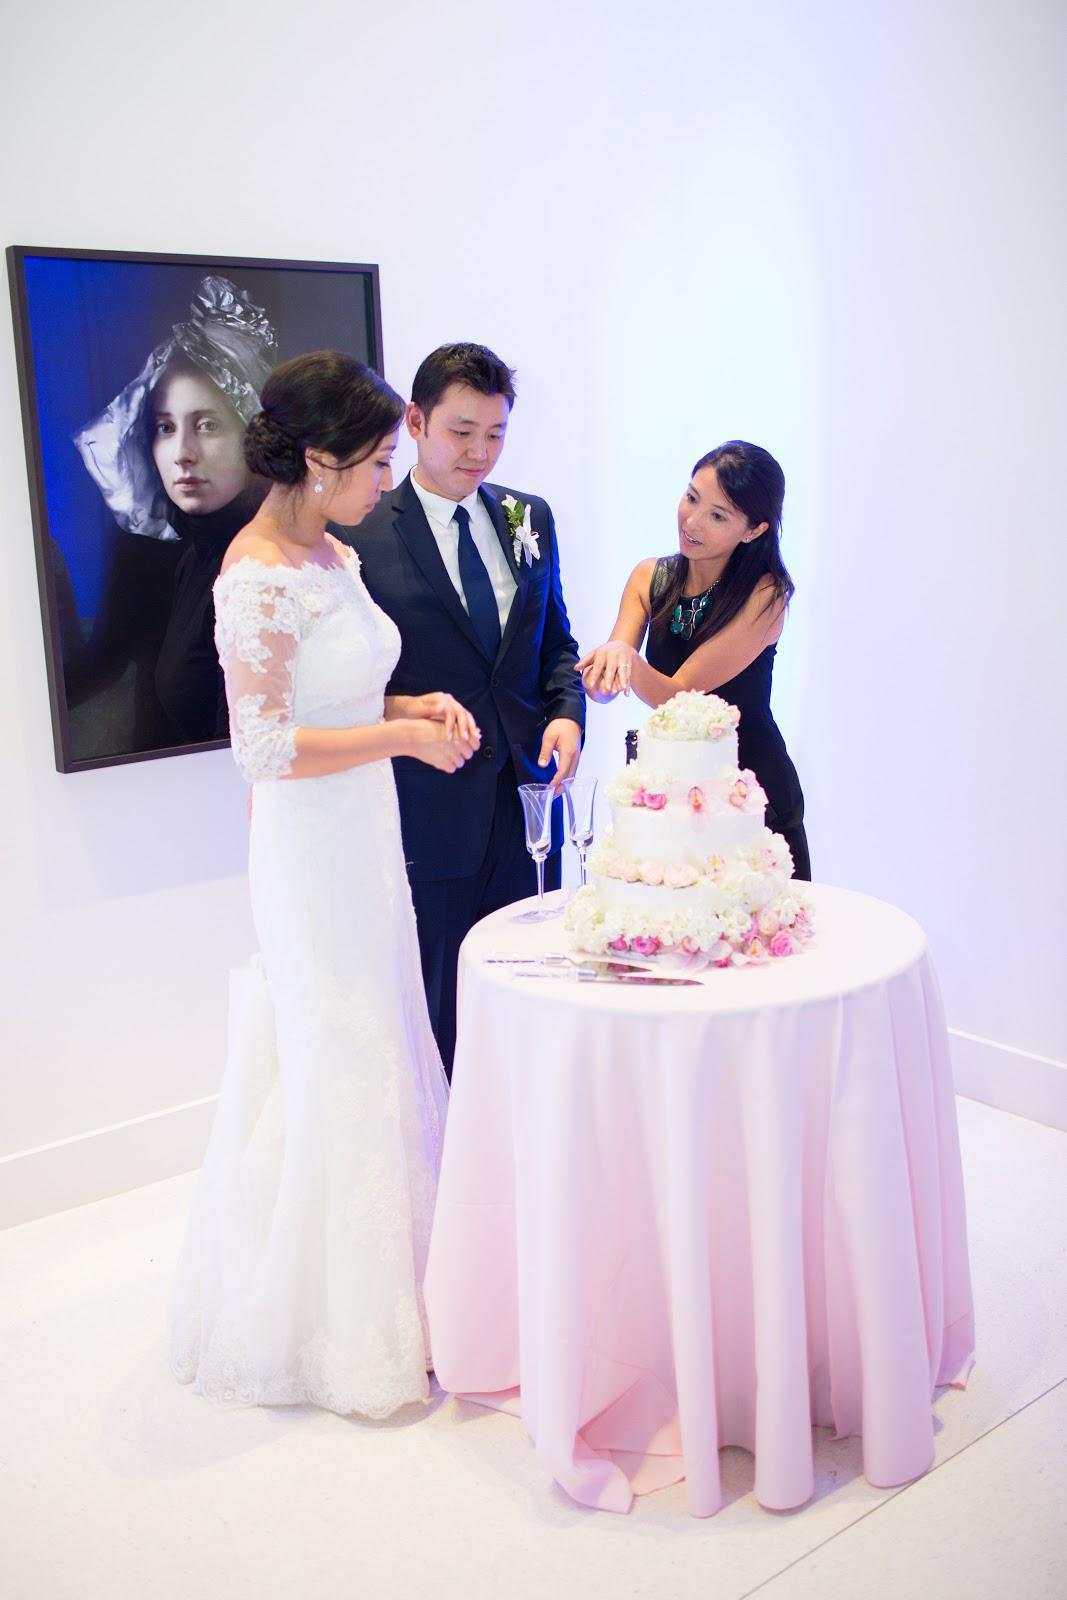 Angie and John-14 Cake and Cutting-0002.jpg